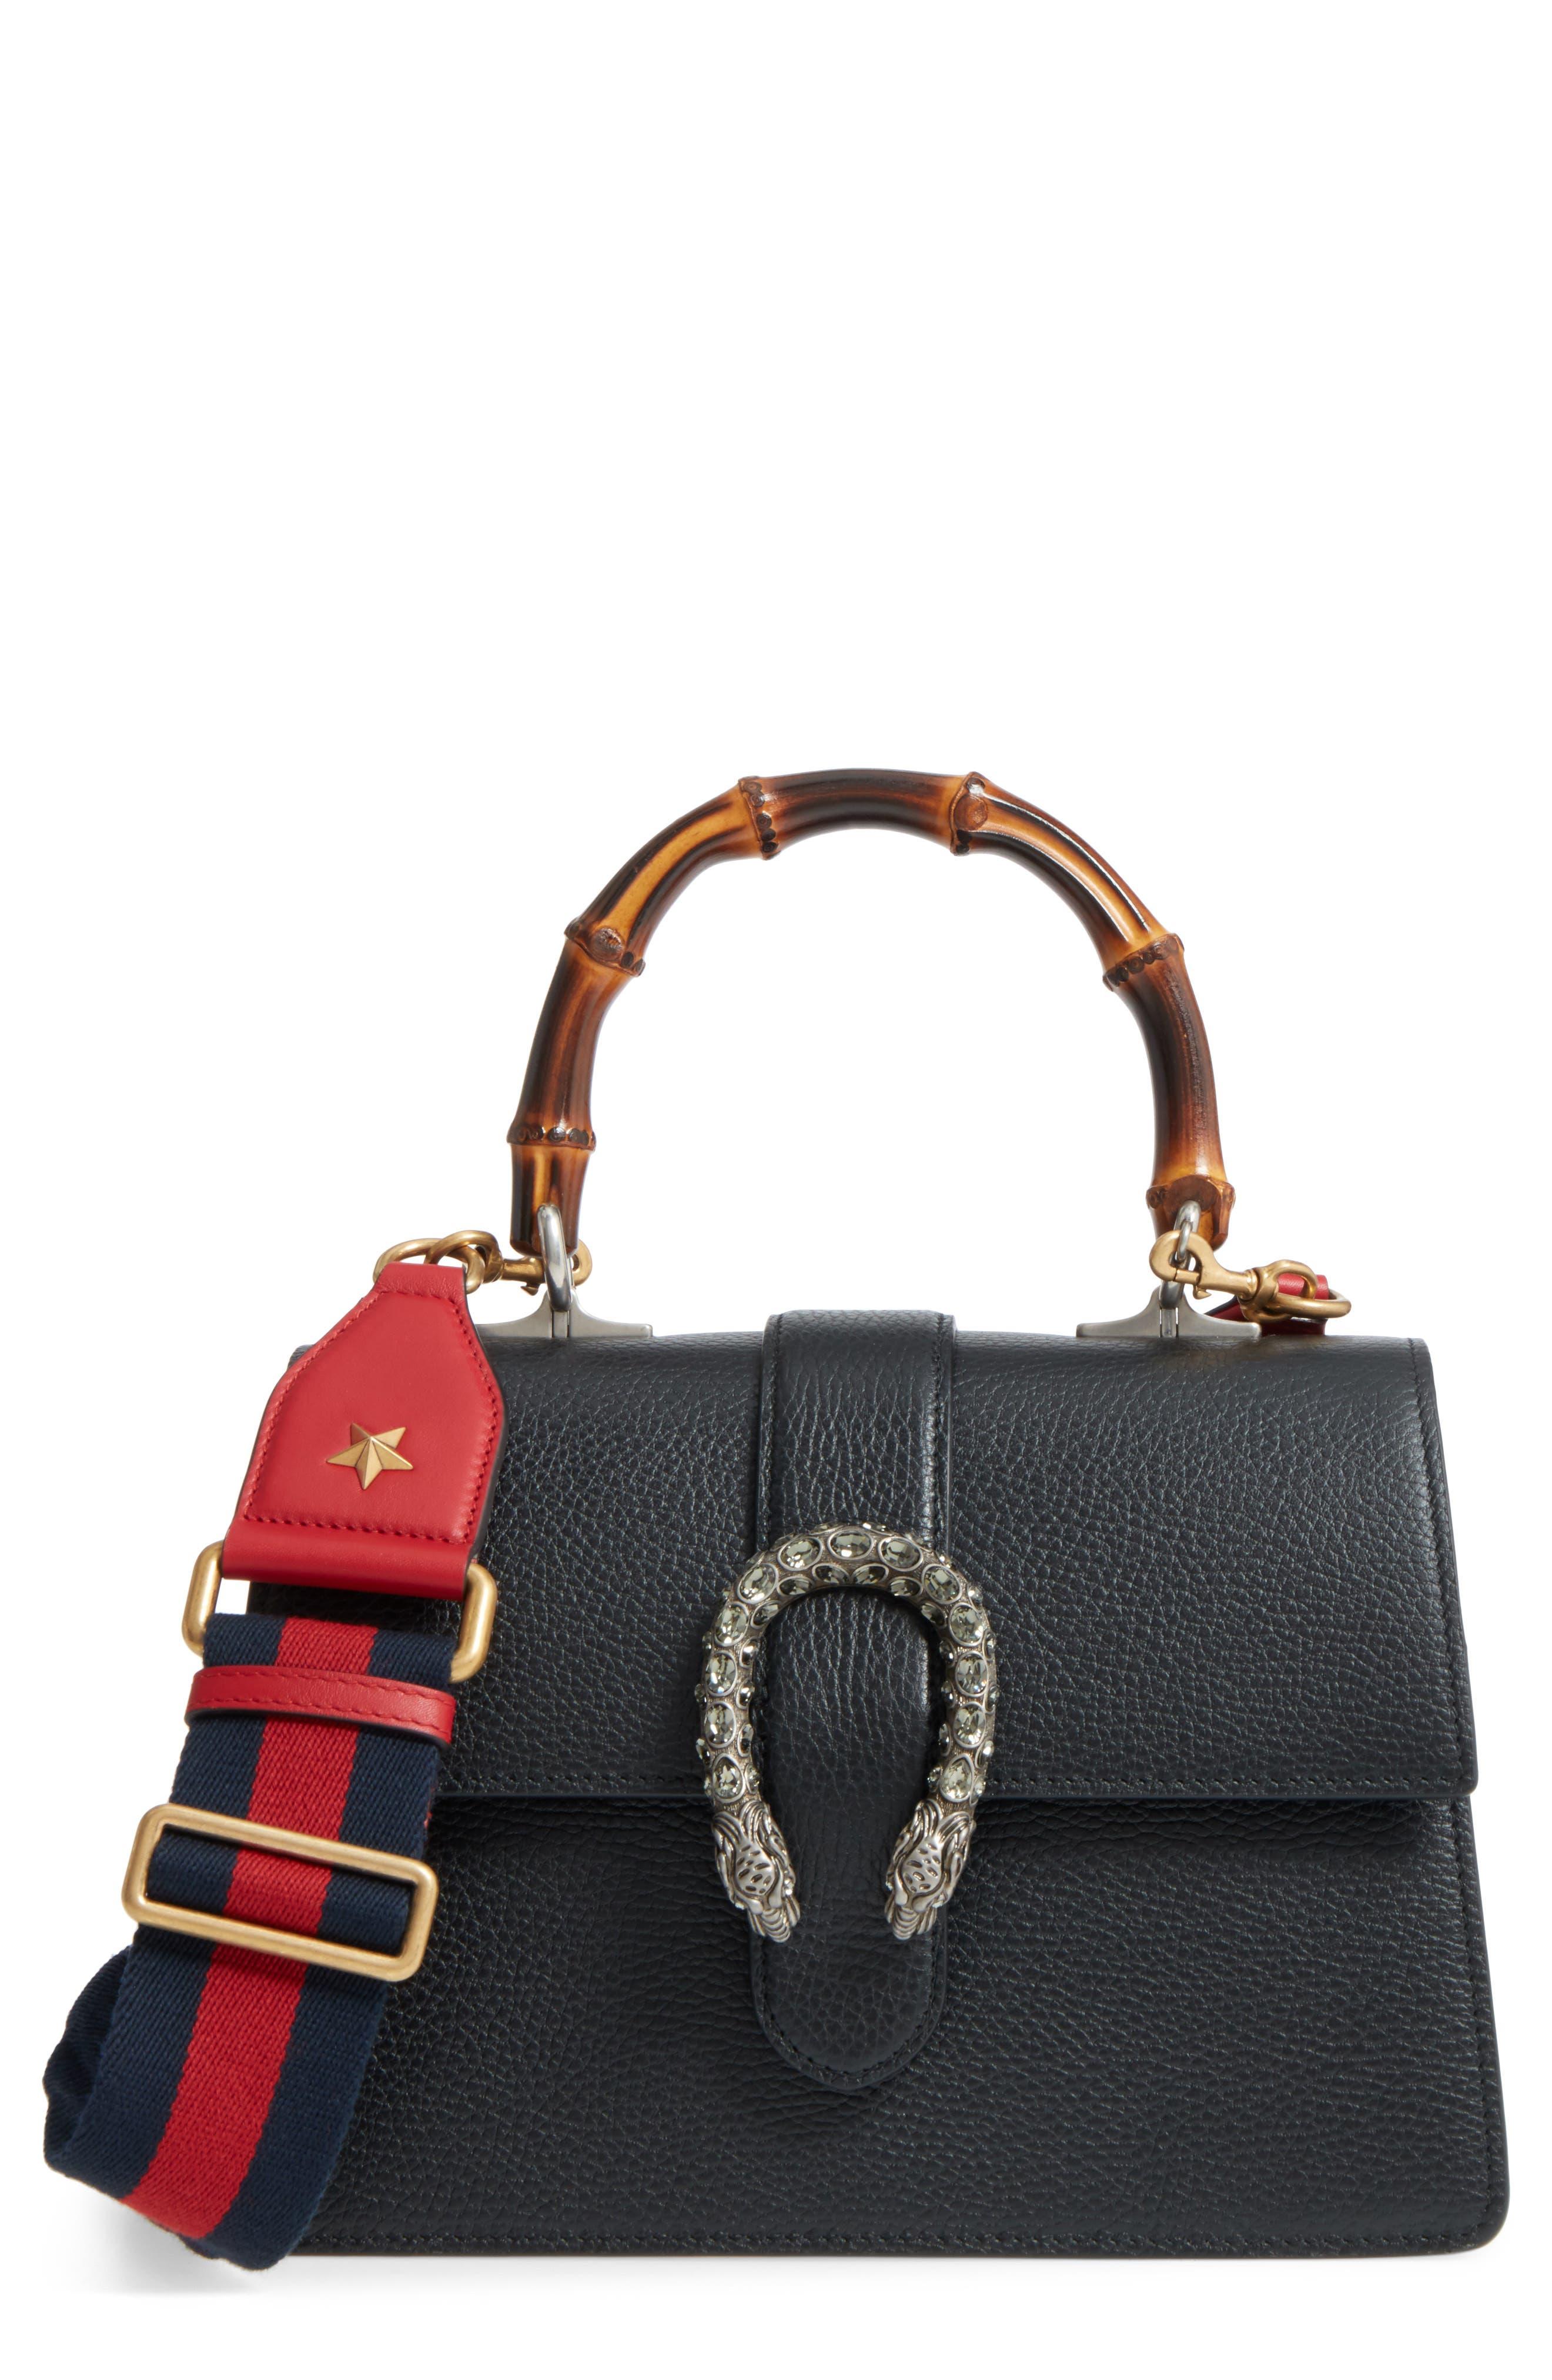 Medium Dionysus Leather Top Handle Satchel,                         Main,                         color, Nero/ Vrv/ Black Diamond